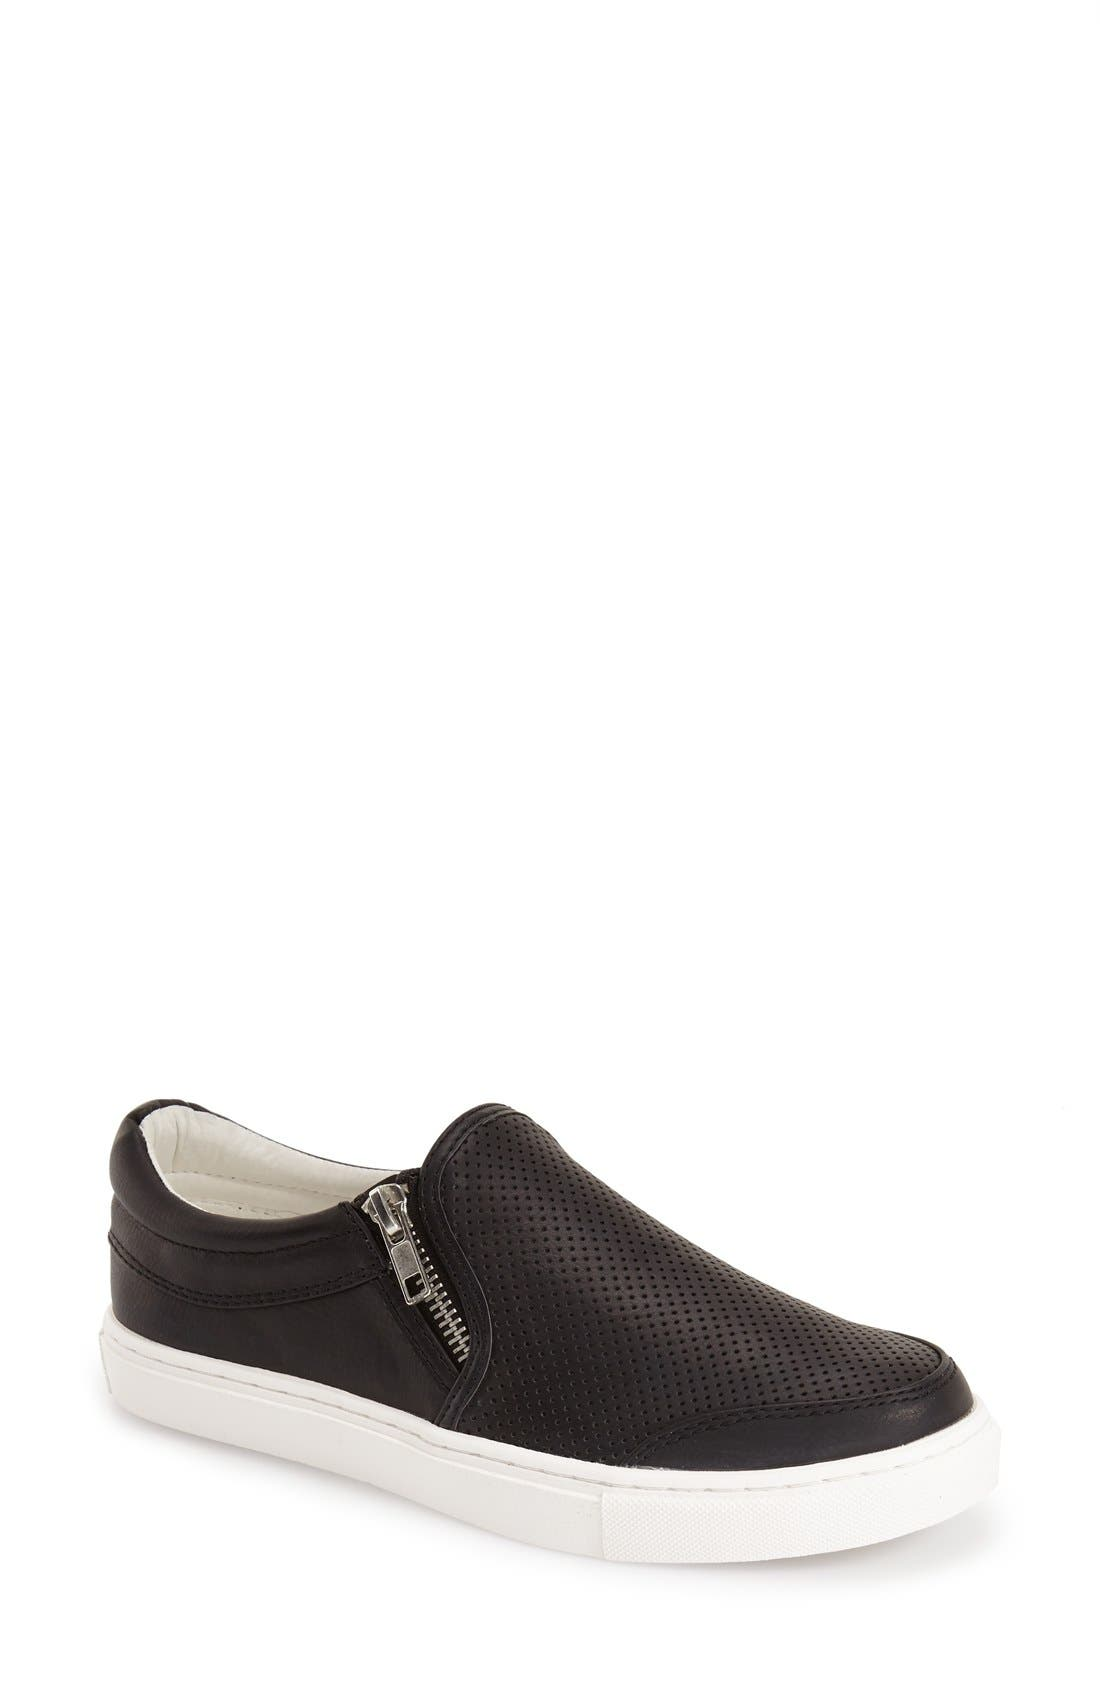 'Ellias' Slip-On Sneaker, Main, color, 001